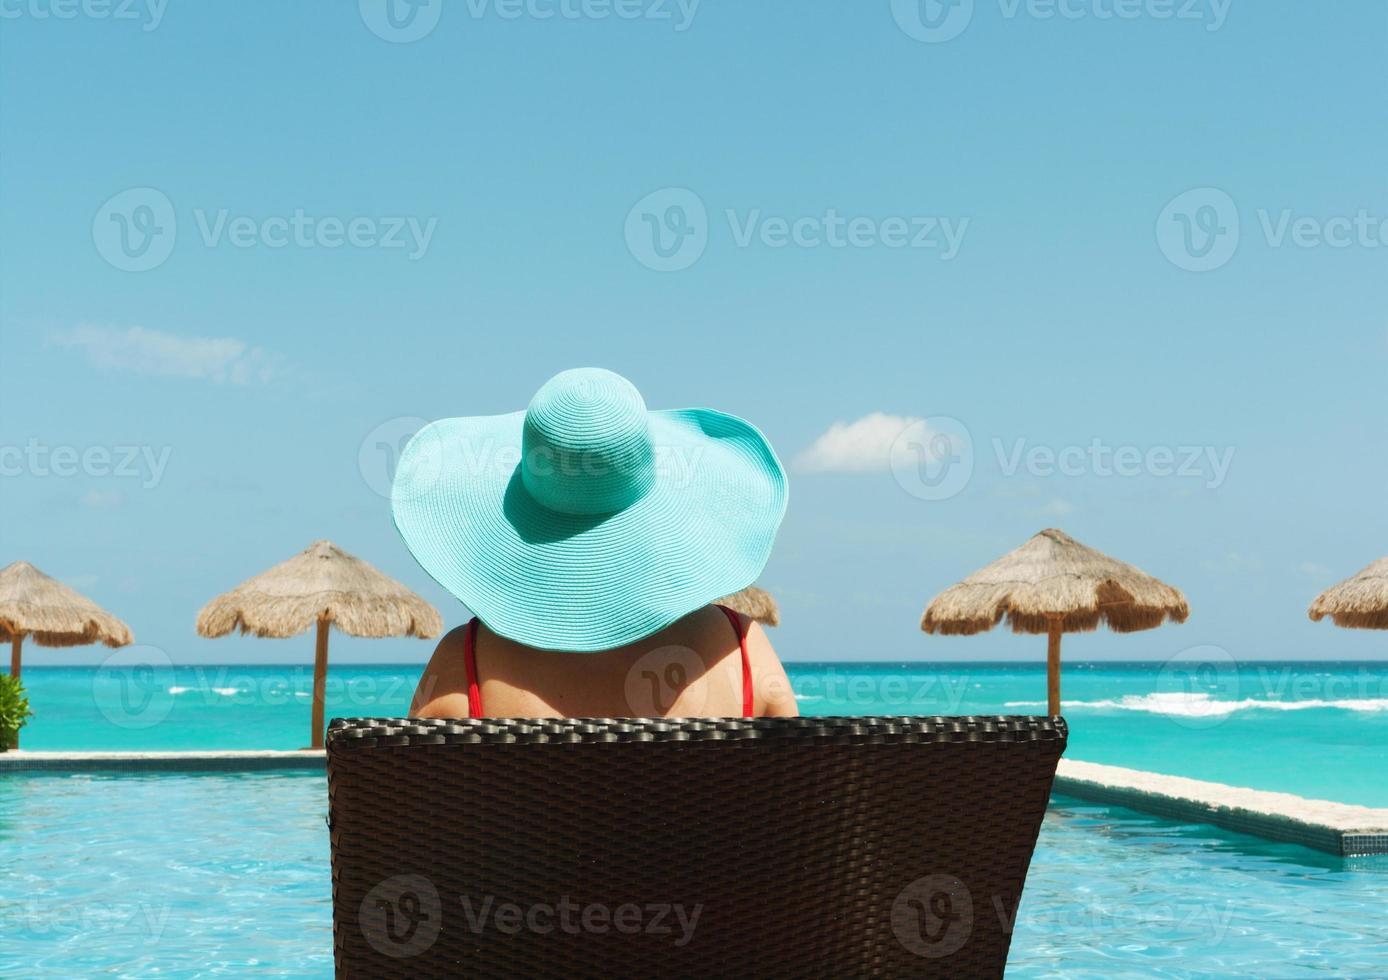 playa tropical vacaciones tomar el sol piscina, palapas, mar caribe foto